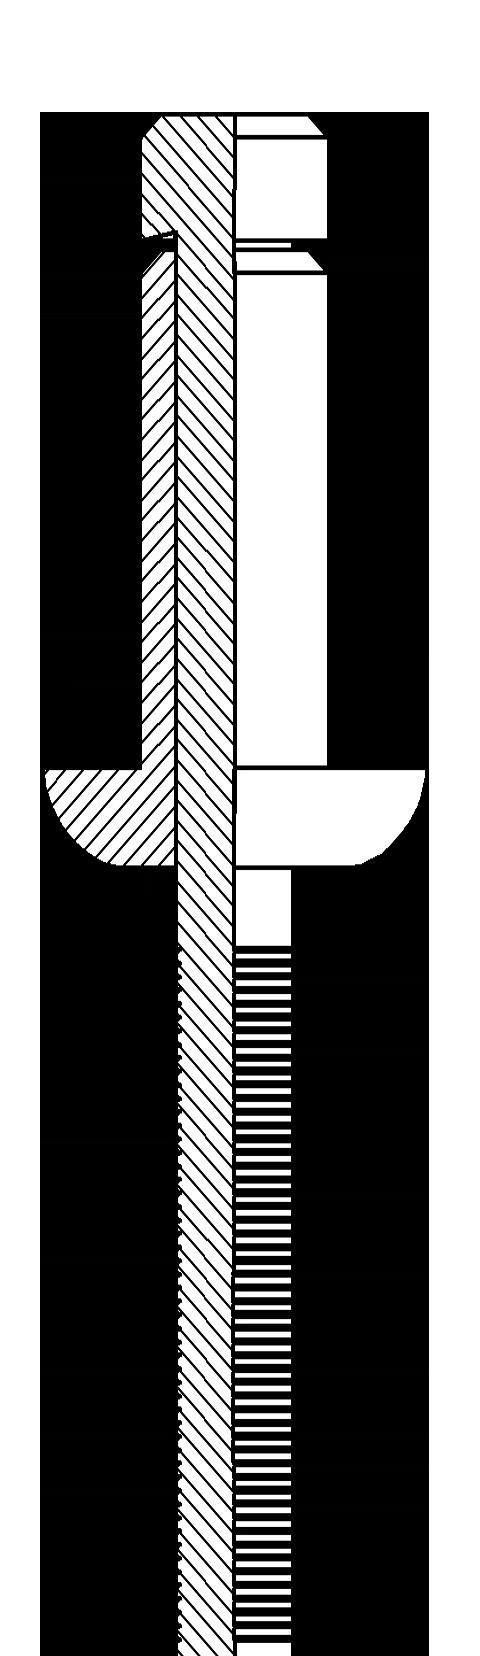 Structural H-link